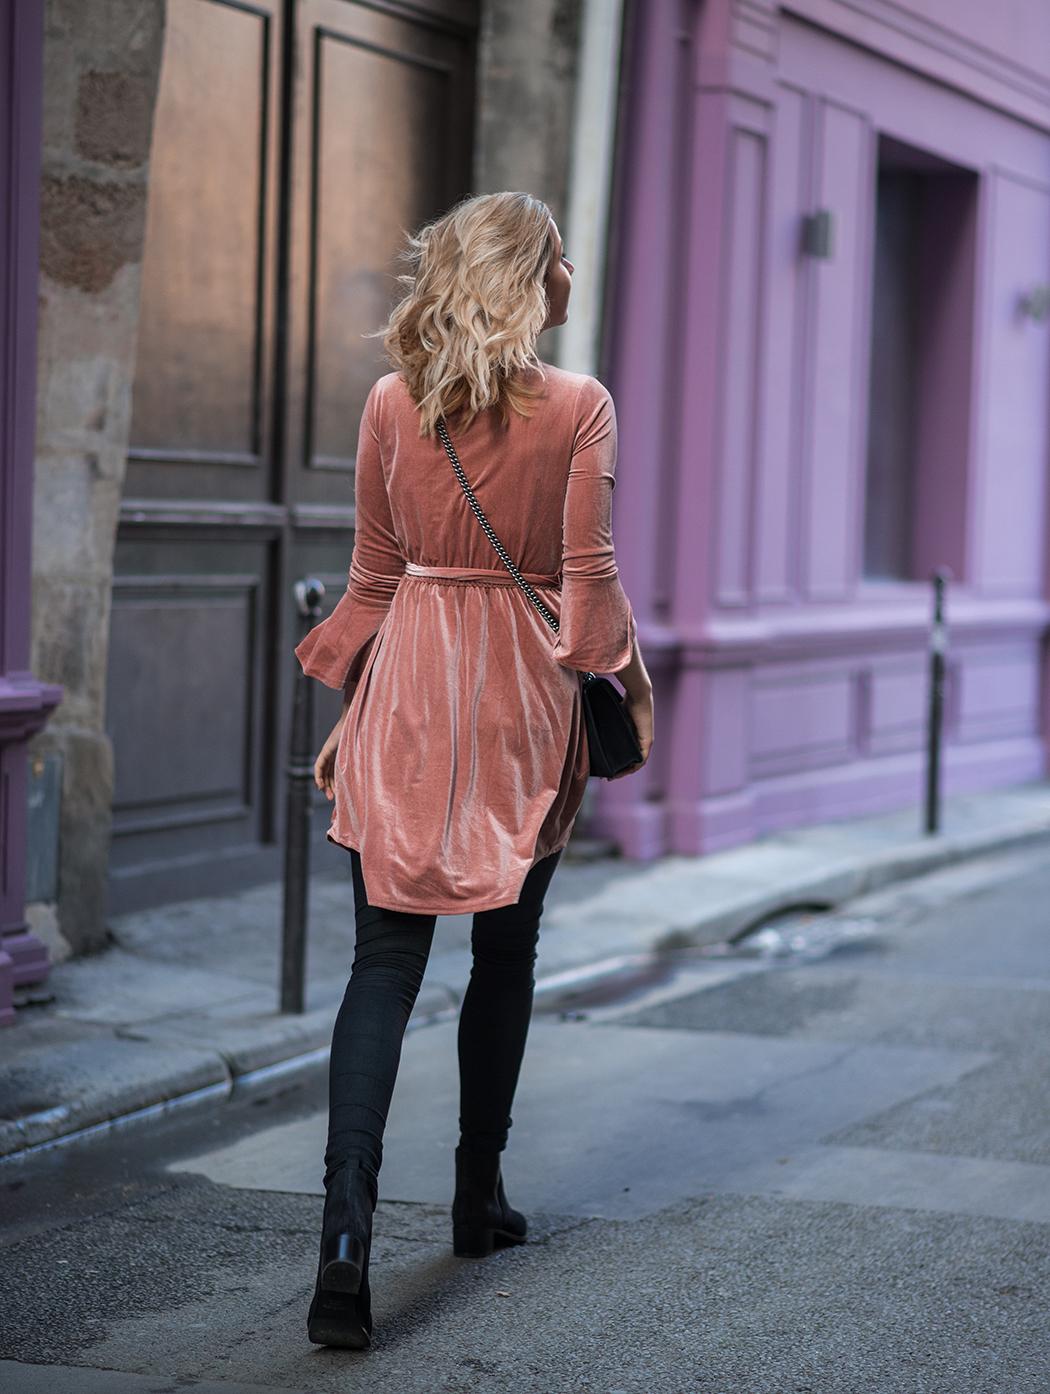 fashionblog-fashionblogger-fashion-blog-blogger-modeblogger-paris-samt-velvet-lindarella-1-web